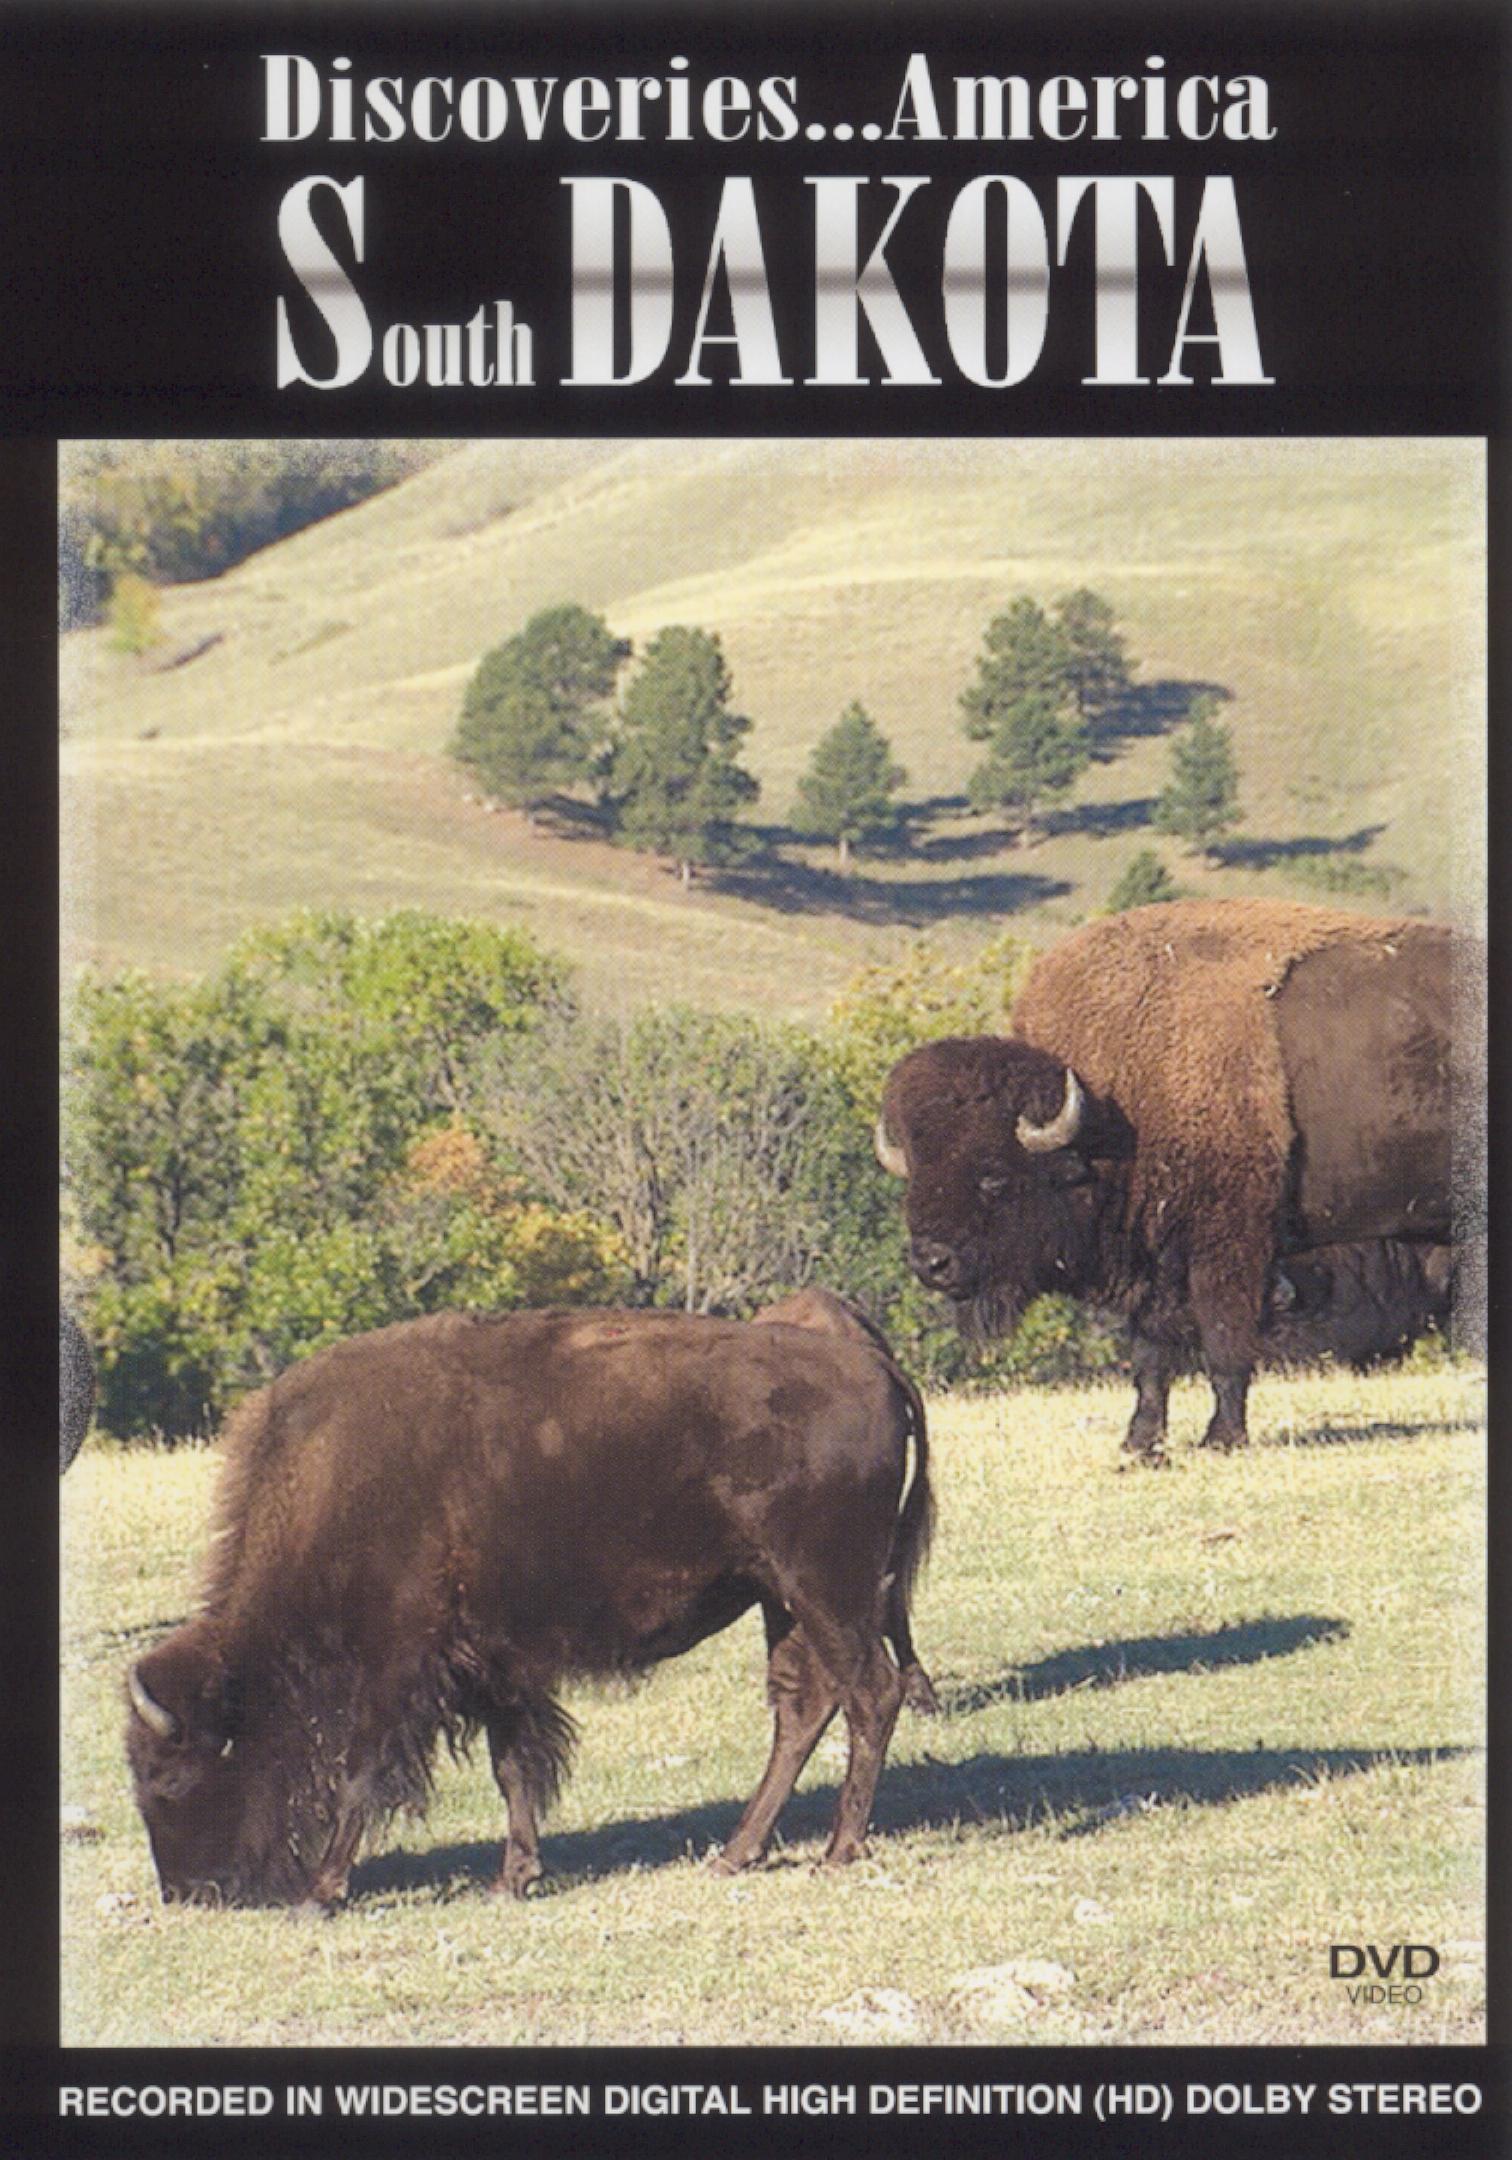 Discoveries... America: South Dakota